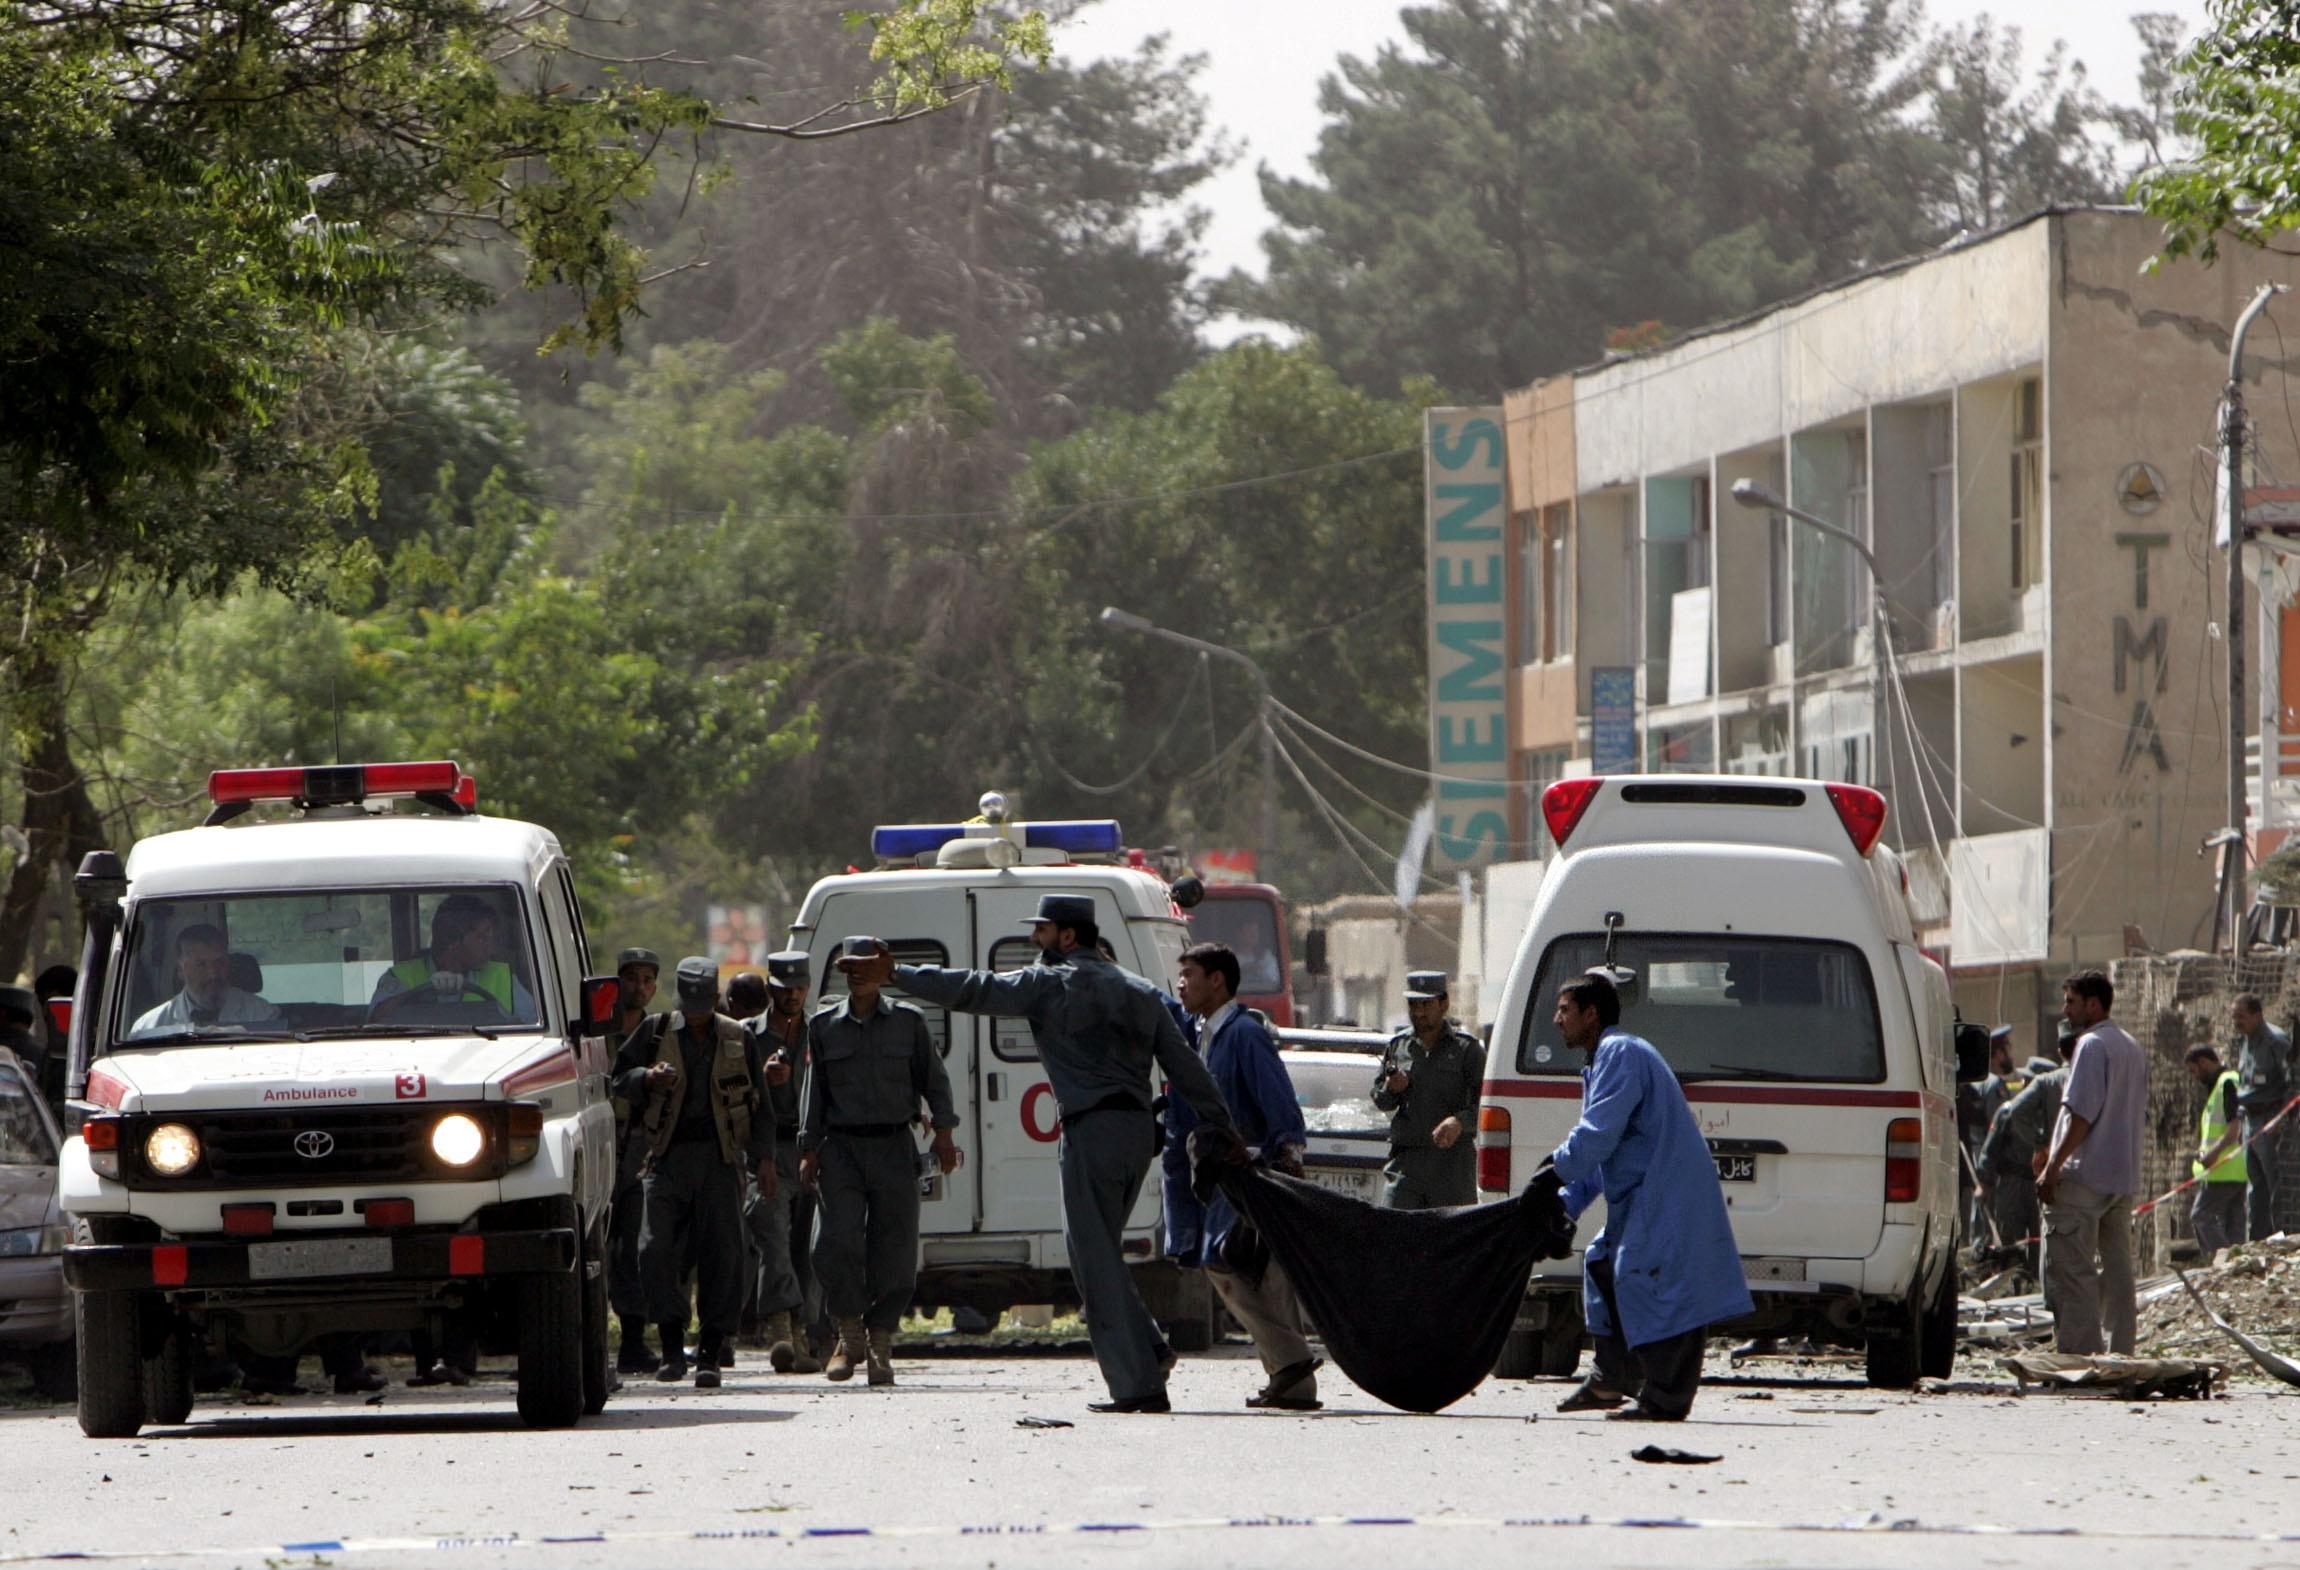 Afghanistan_polizia_ambulanza_Xin